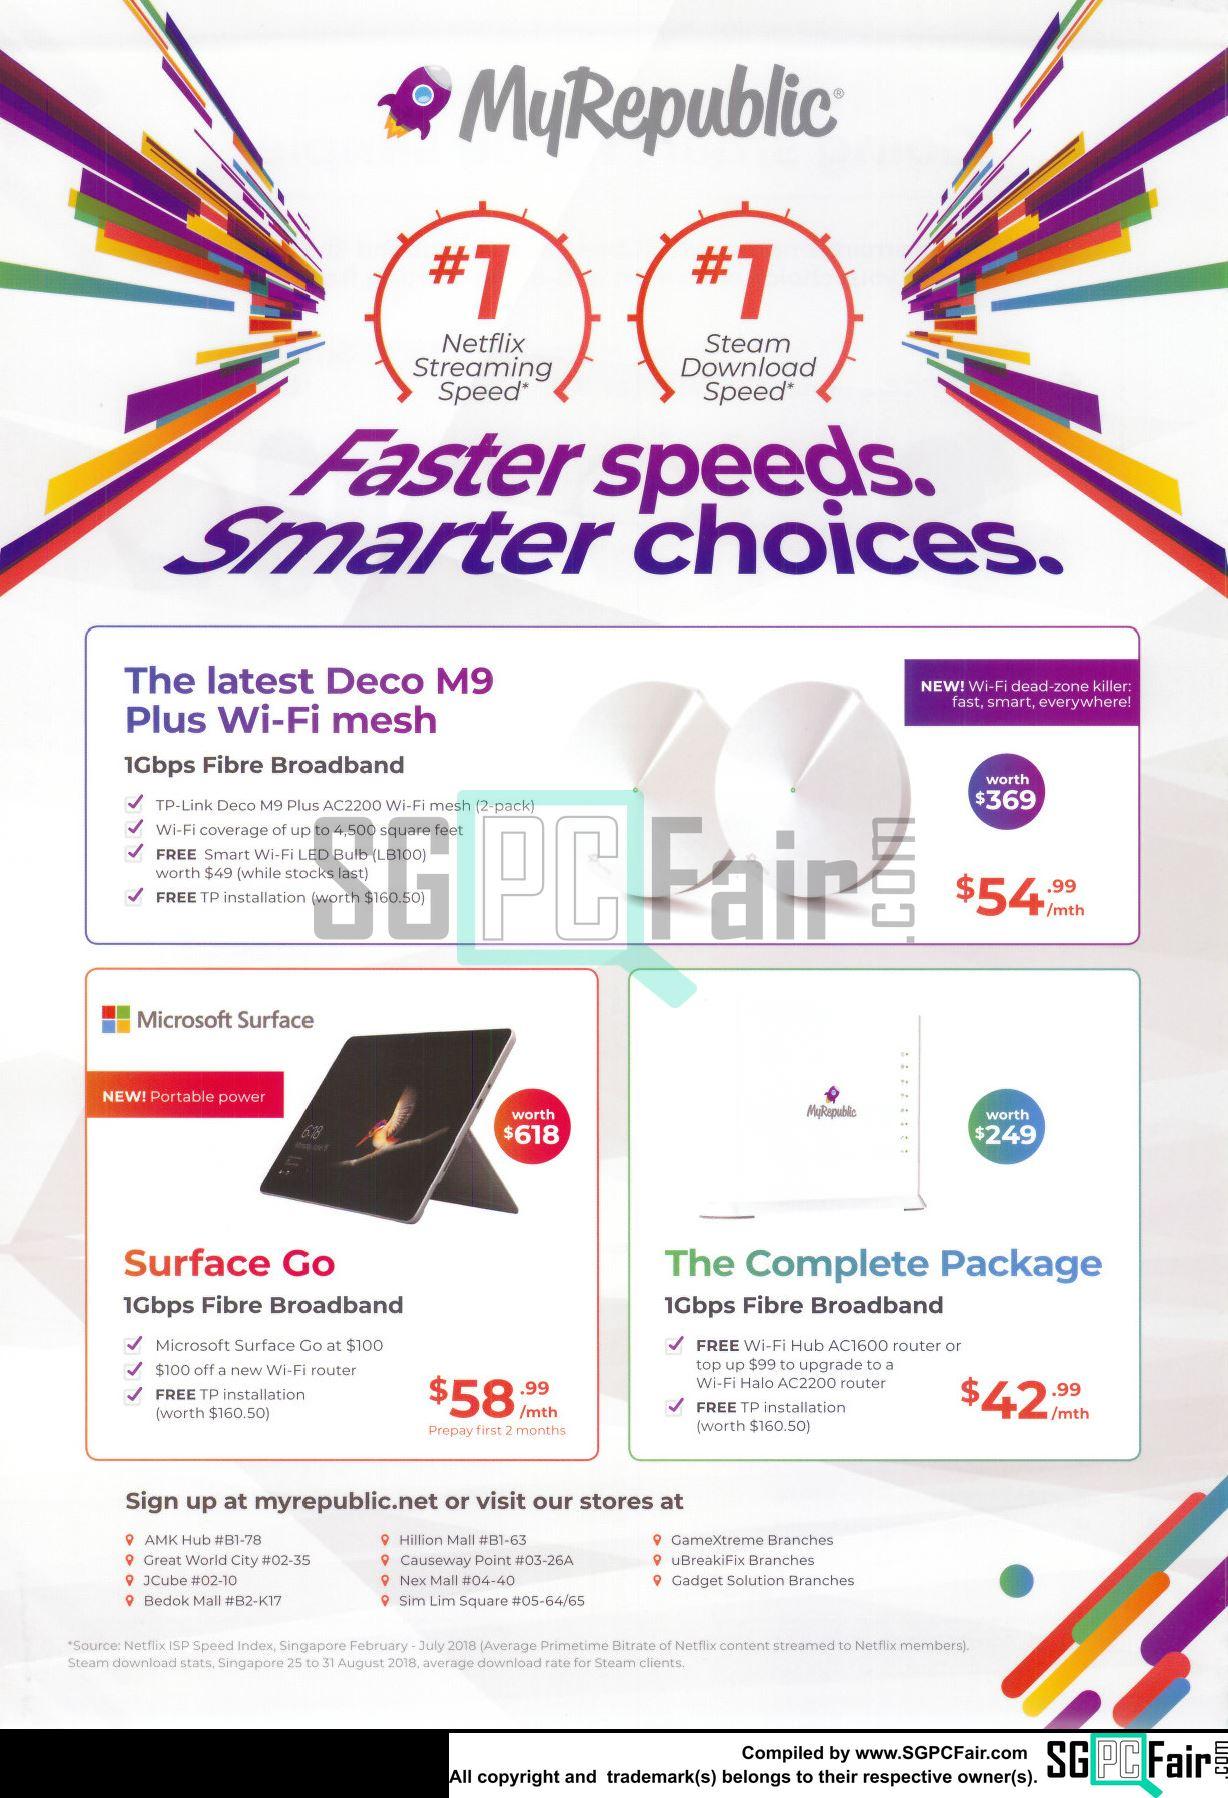 SG PC Fair - Online Brochures, Flyers and Price List: MyRepublic